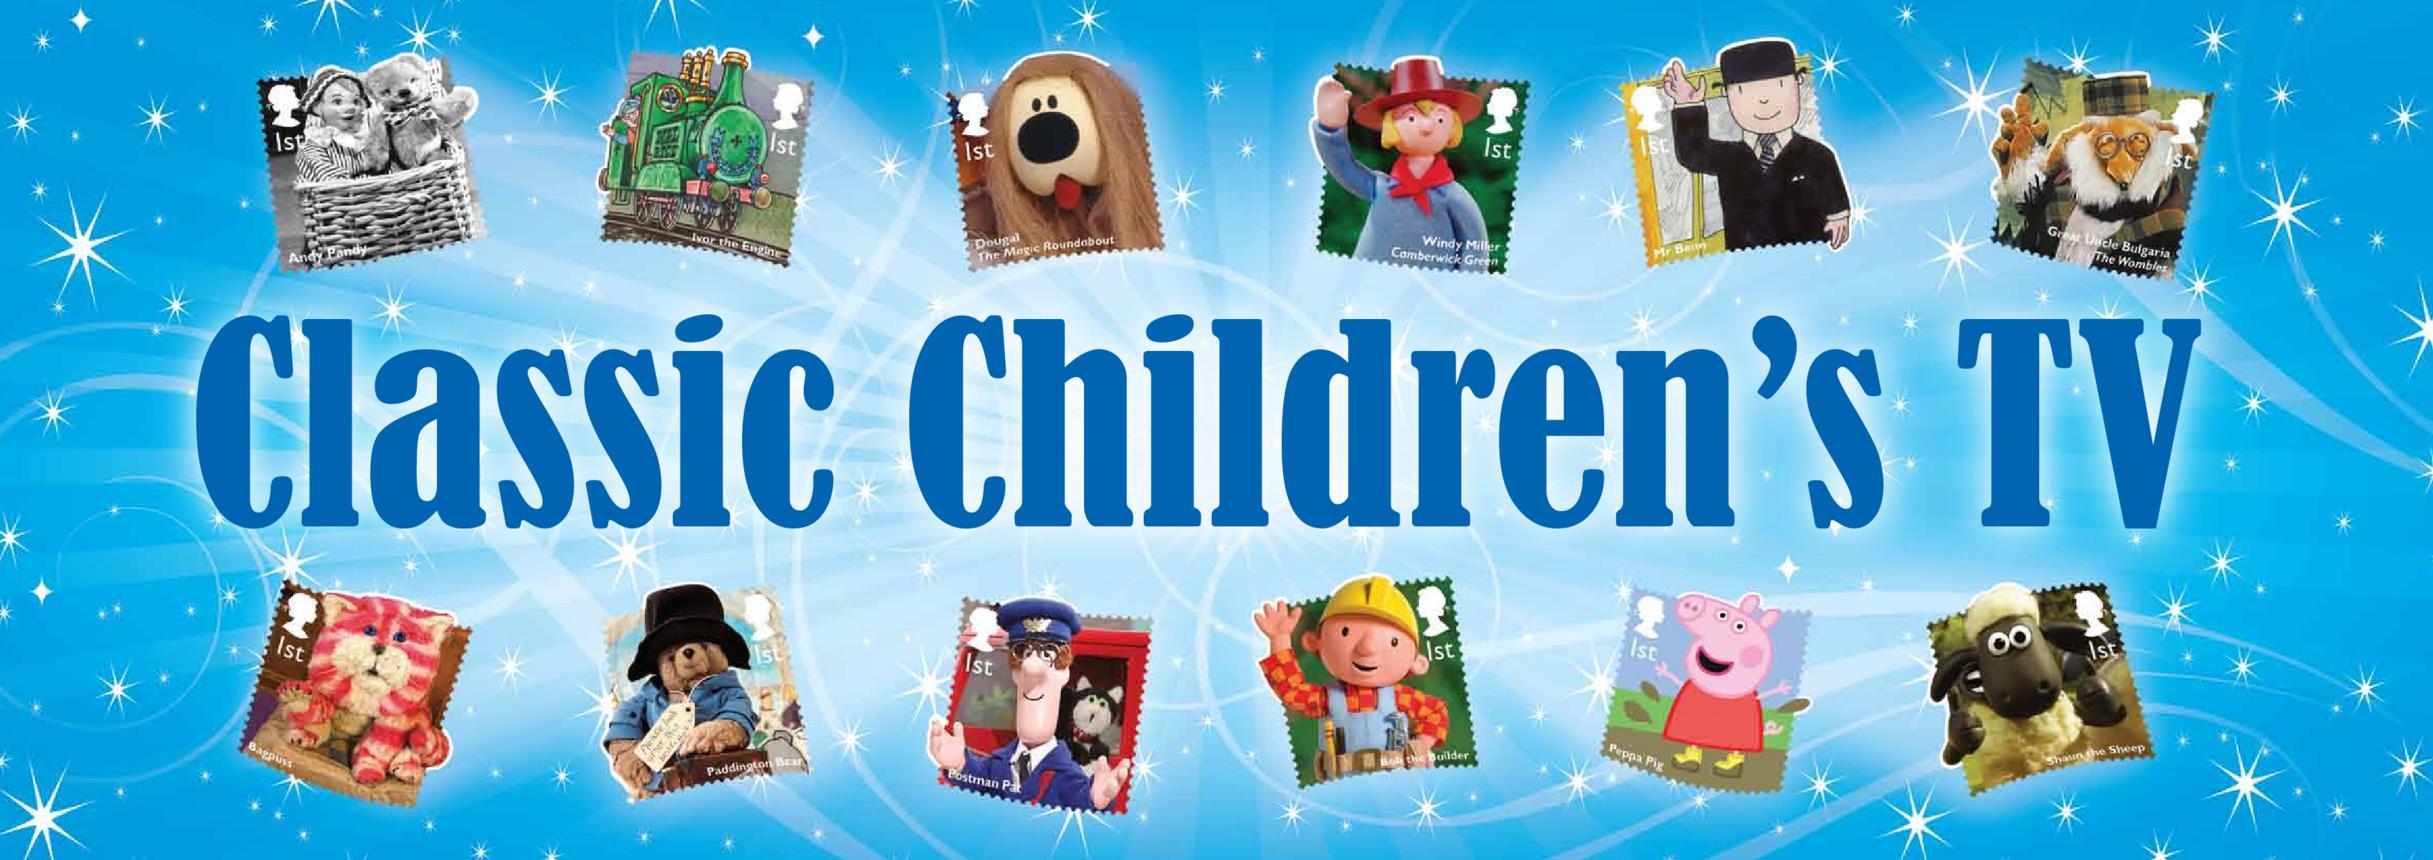 Wall Display Long Version - Classic Children's TV